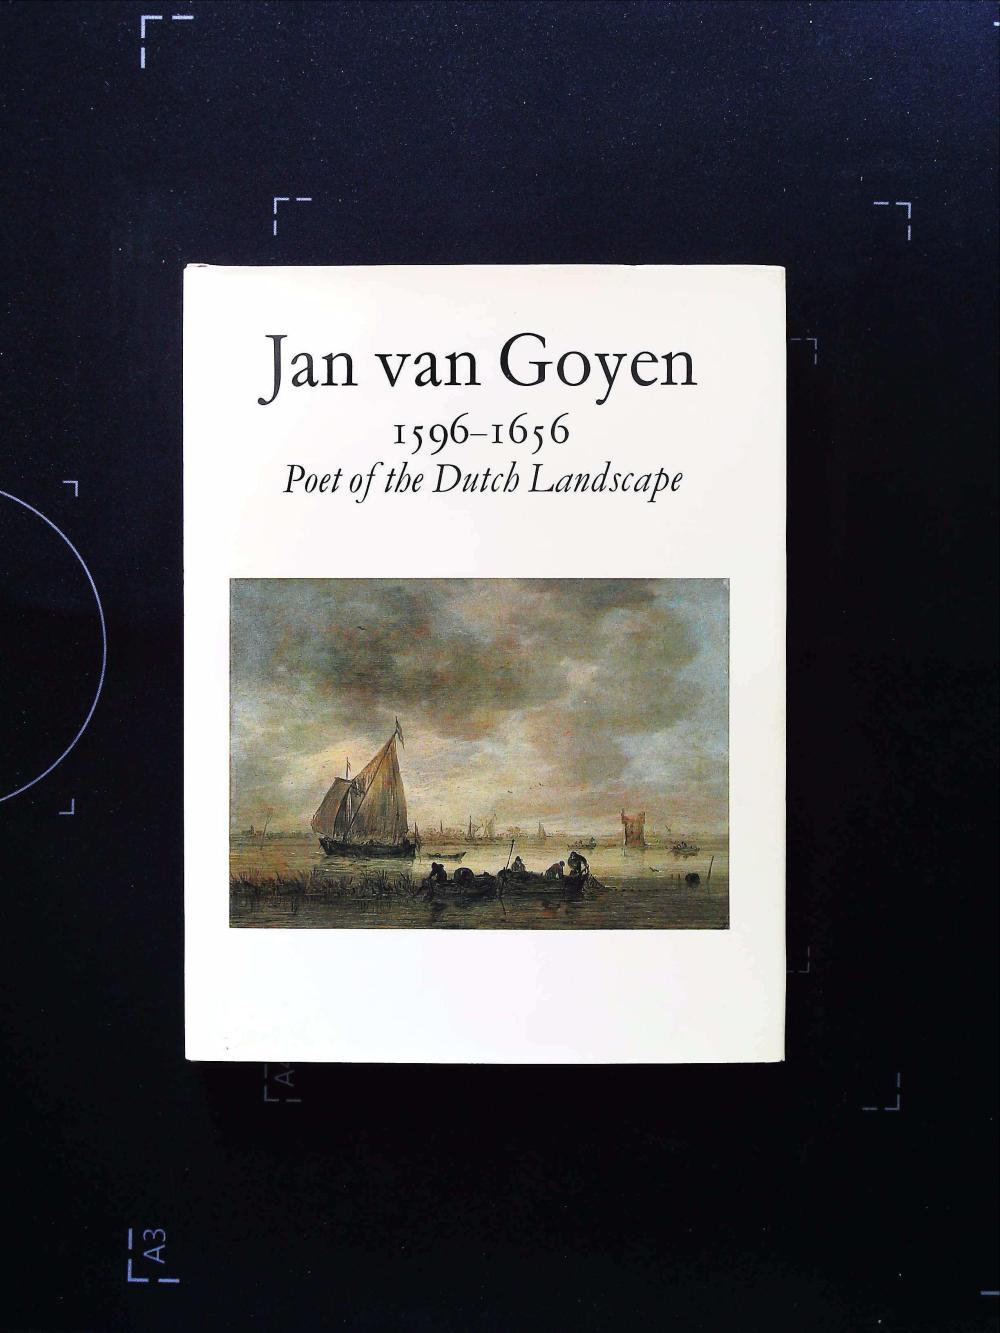 Jan Van Goyen 1596 1656 Poet Of The Dutch Landscape hardback book. Published by Allen Jacobs Gallery